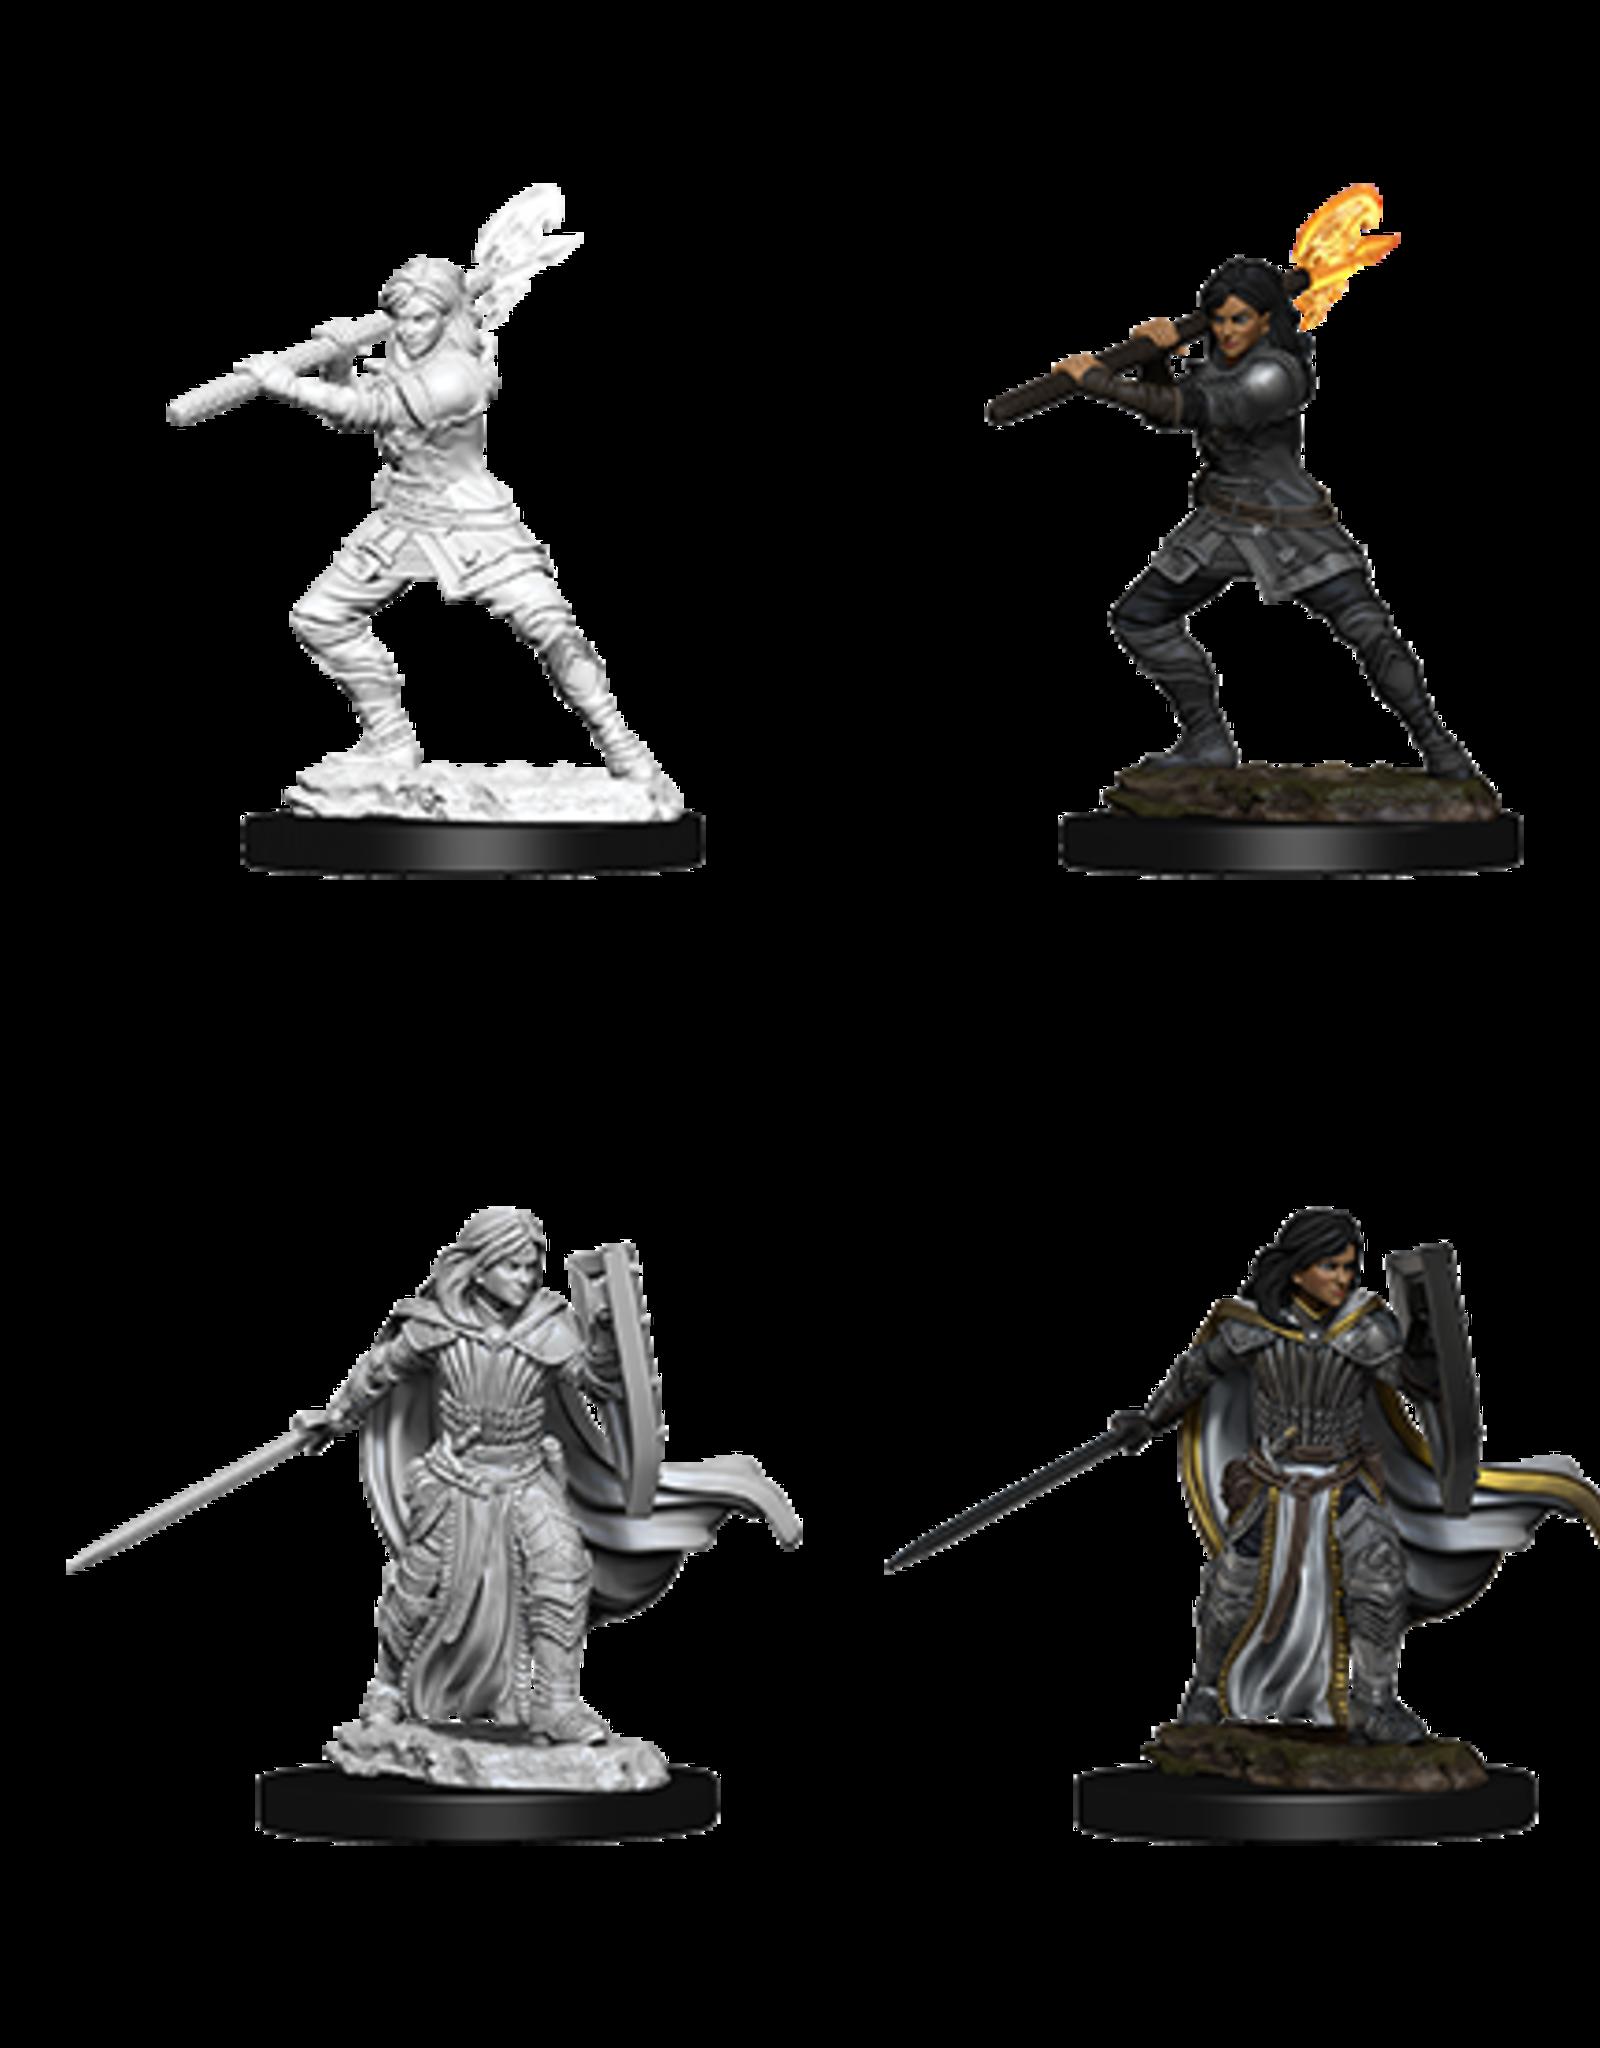 Amazon.com: D&D Fantasy Miniatures 2.5D Wood Laser Cut Figures ... | 2048x1600